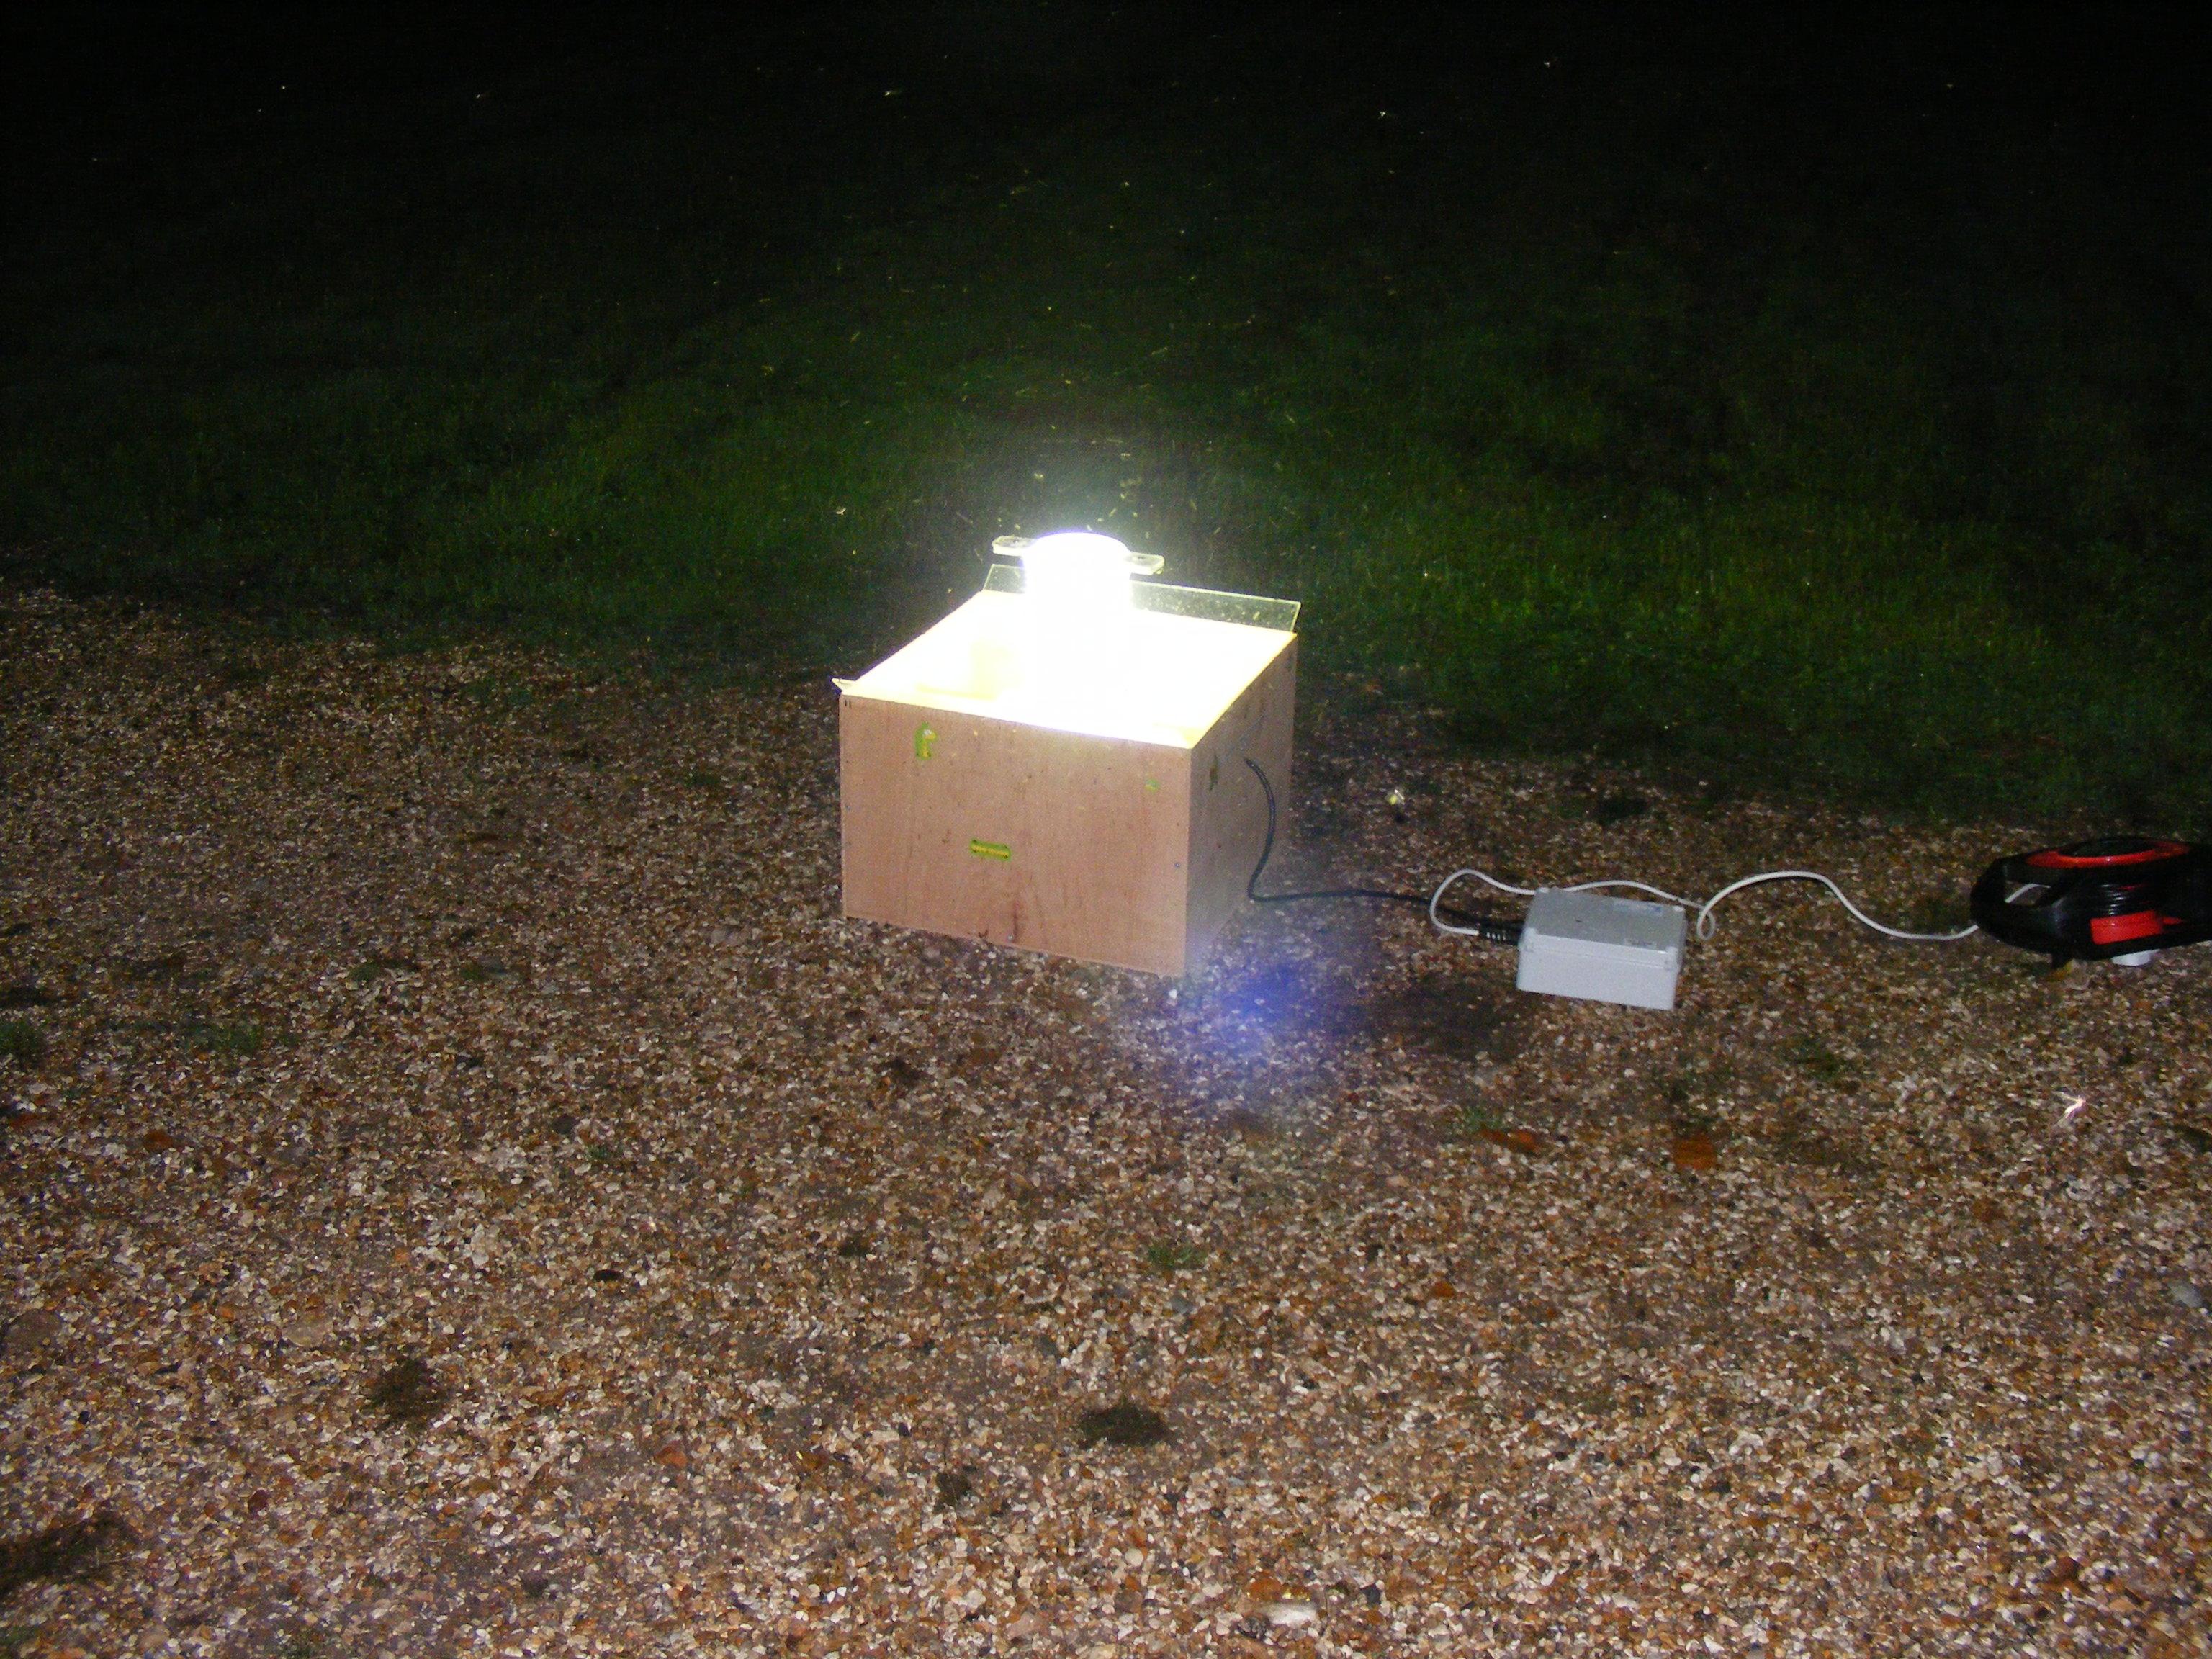 moth-trap-22-8-15-vitacressabbotts-ann